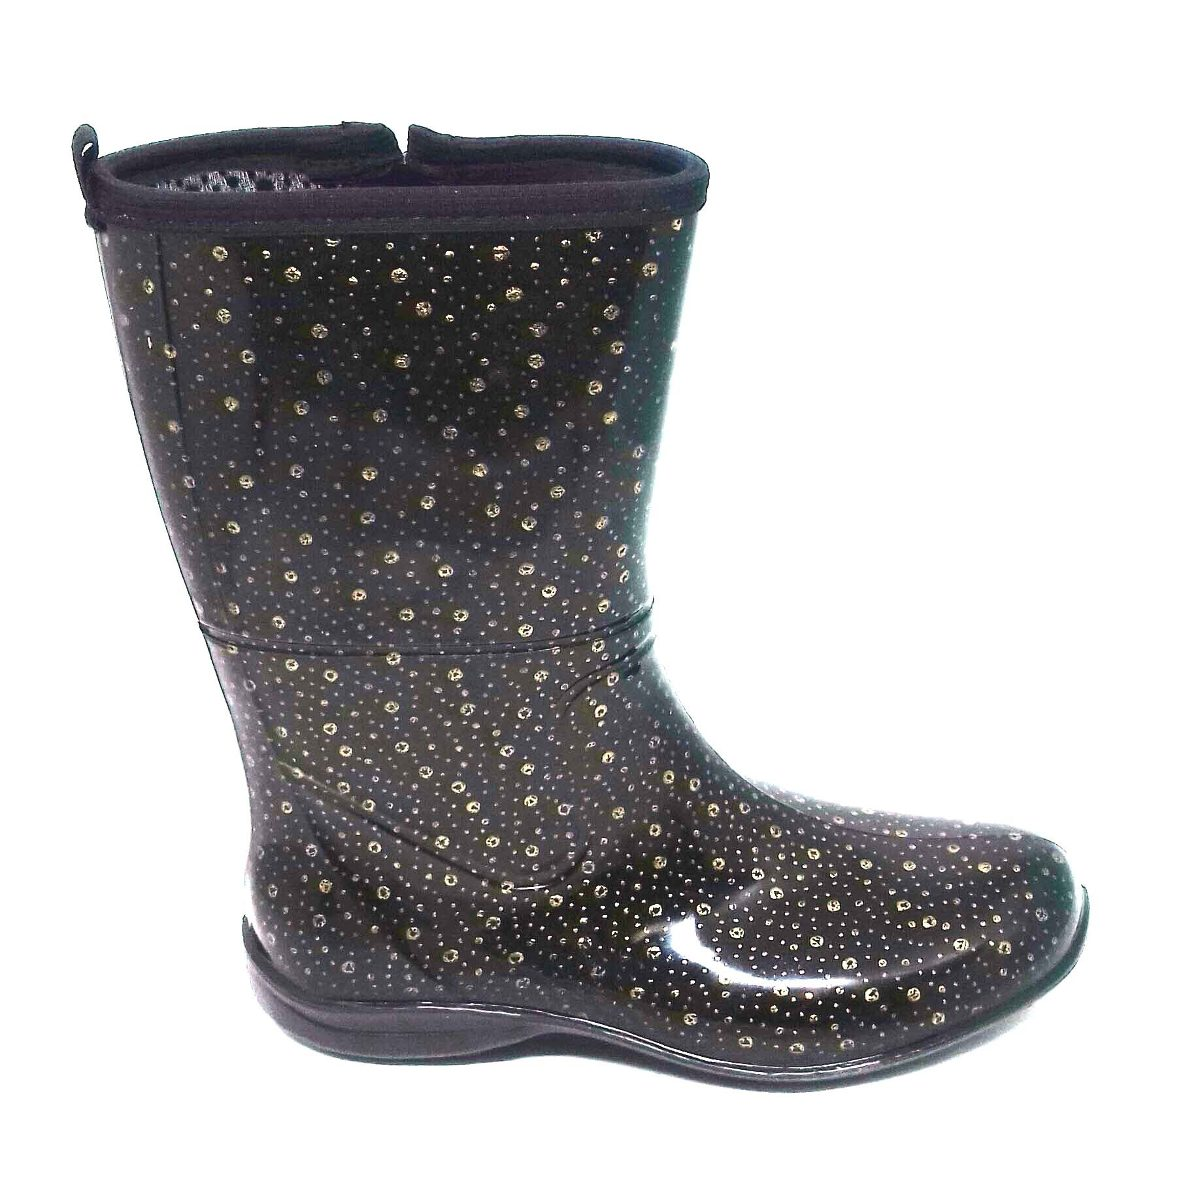 57a4d704fcb bota borracha galocha chuva feminina pat cano médio bolinha. Carregando  zoom.